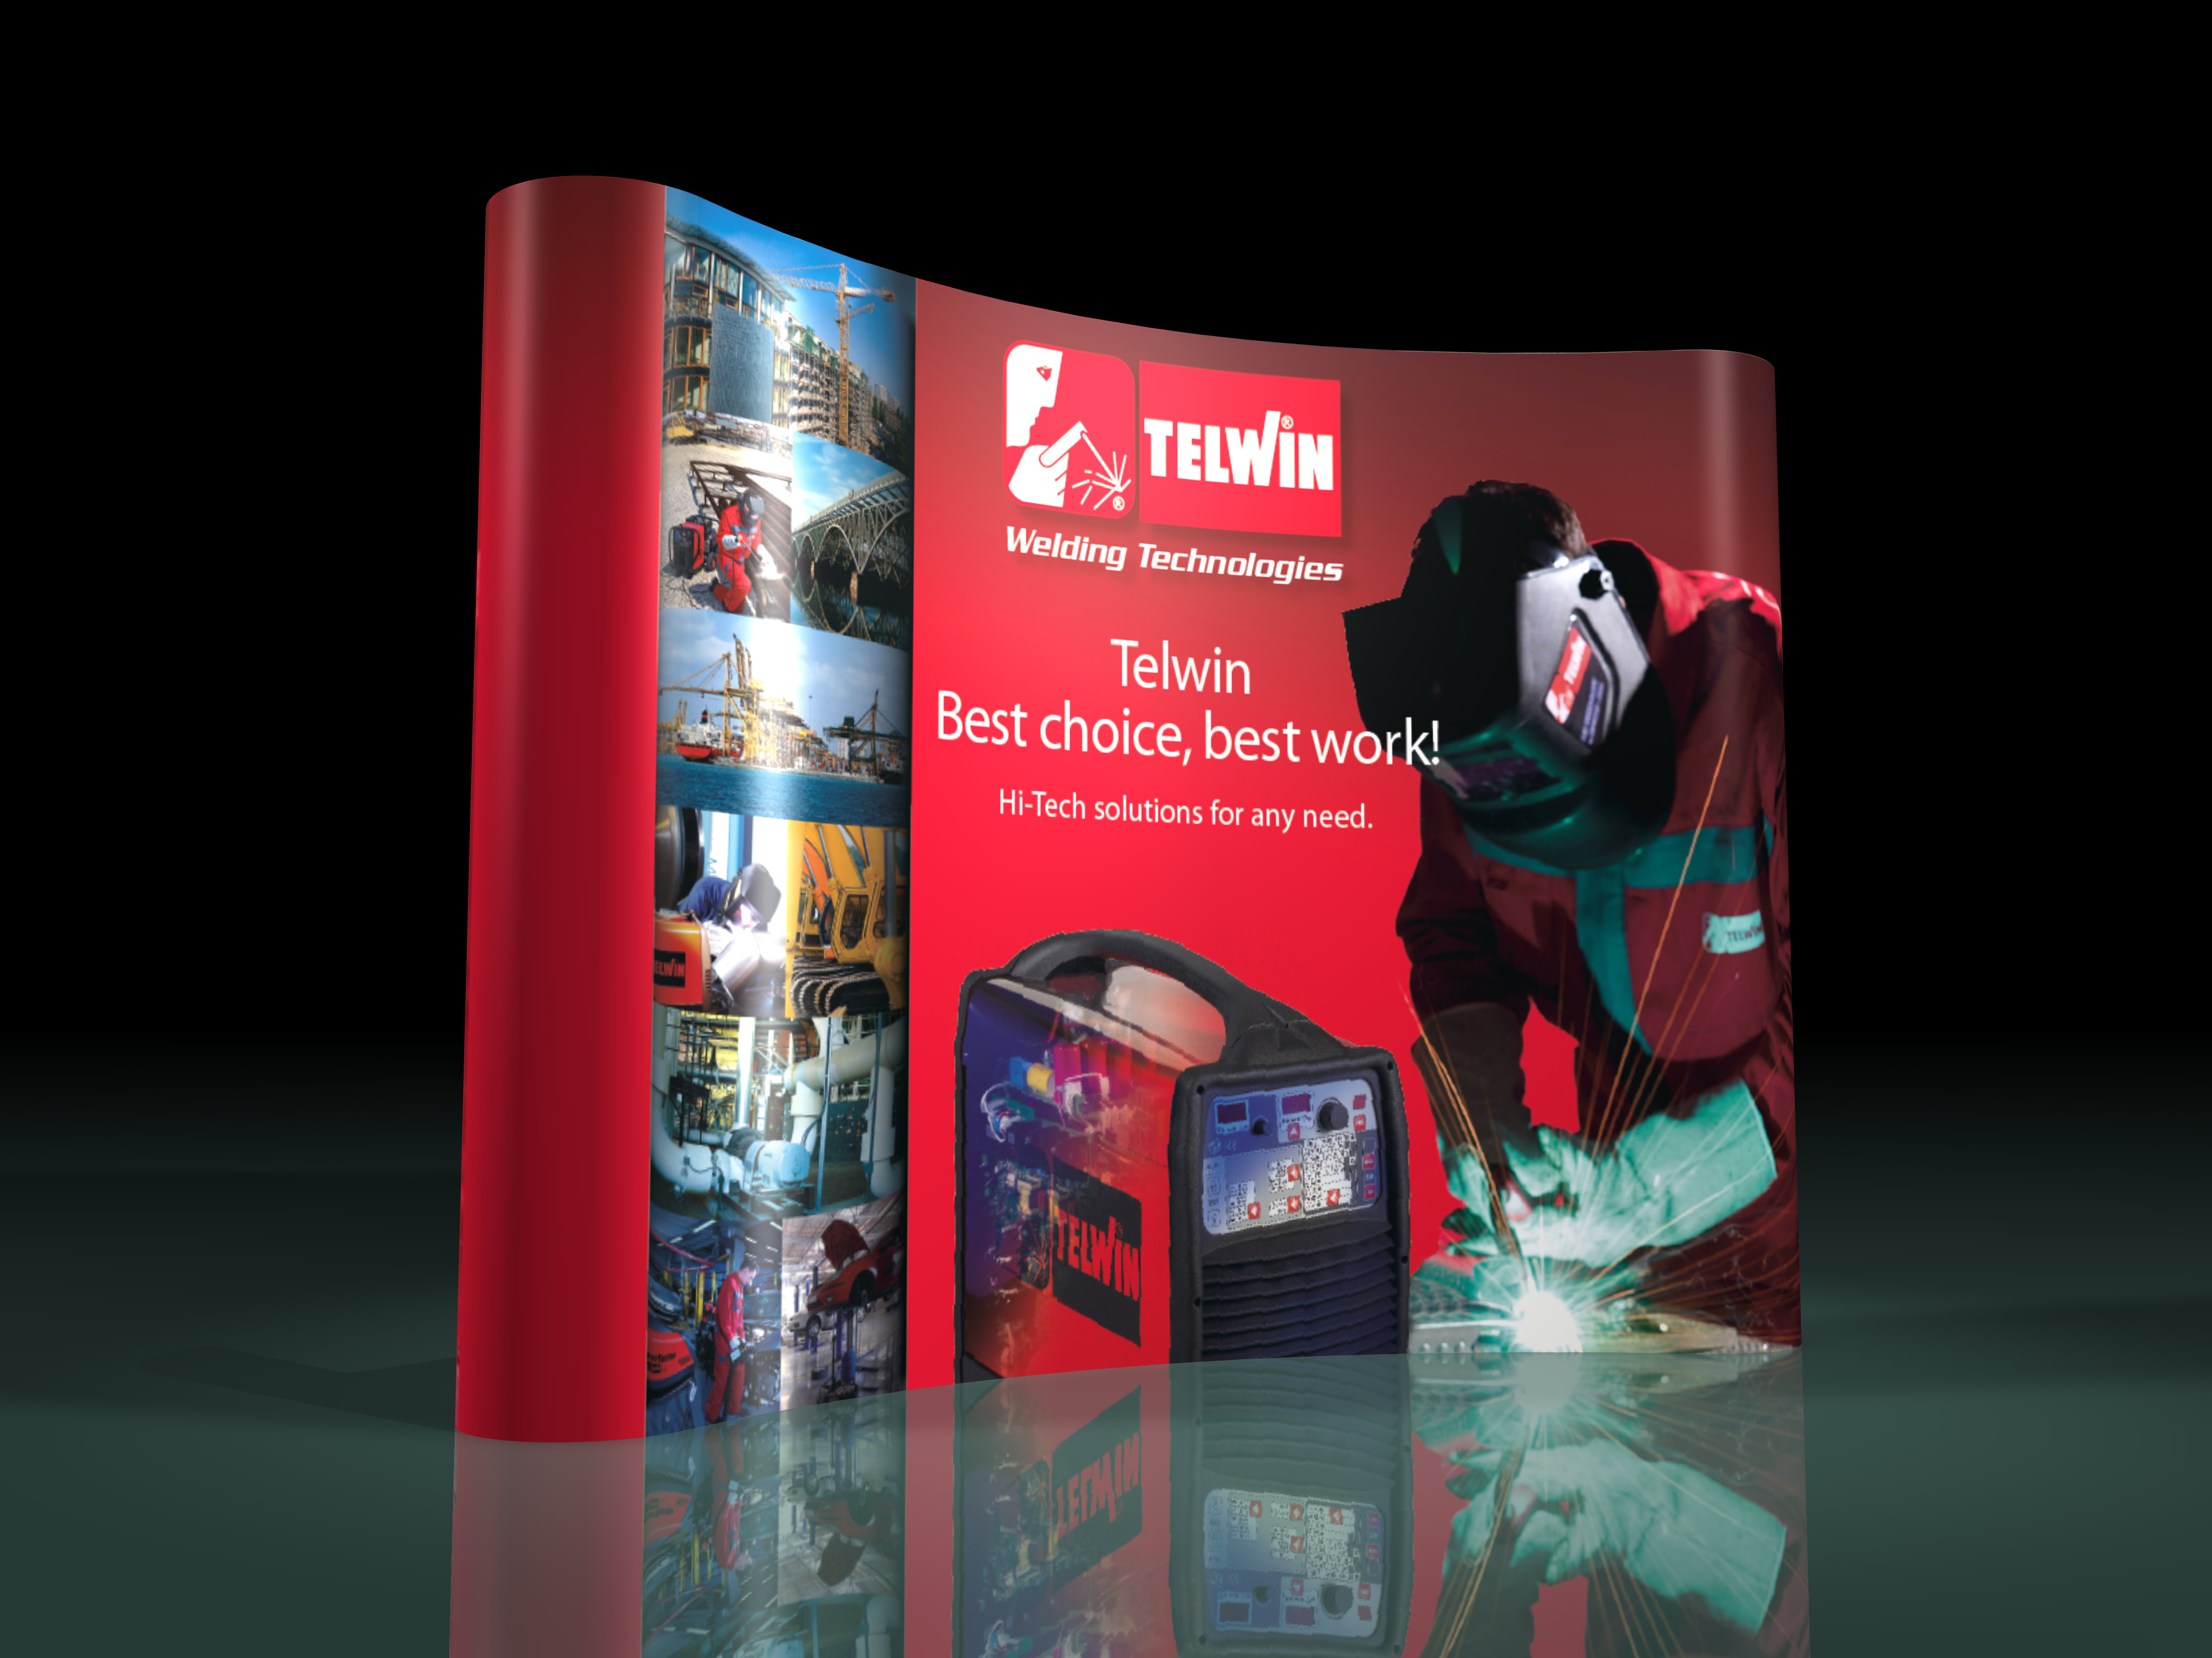 visual merchandising espositore per allestimenti-display-telwin